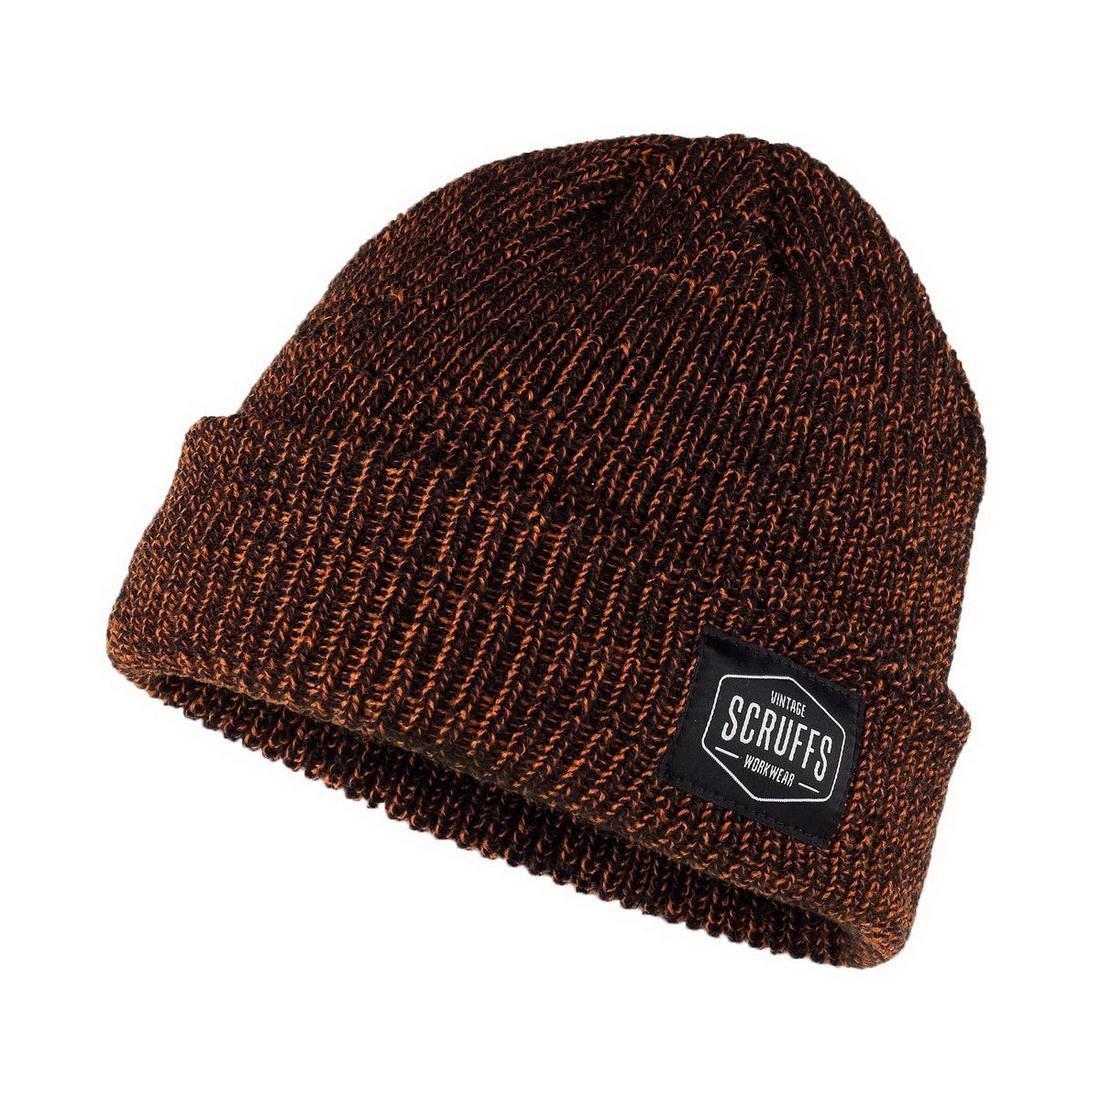 Vintage Microfleece Thermal Beanie Hat One Size Orange/Black T53061